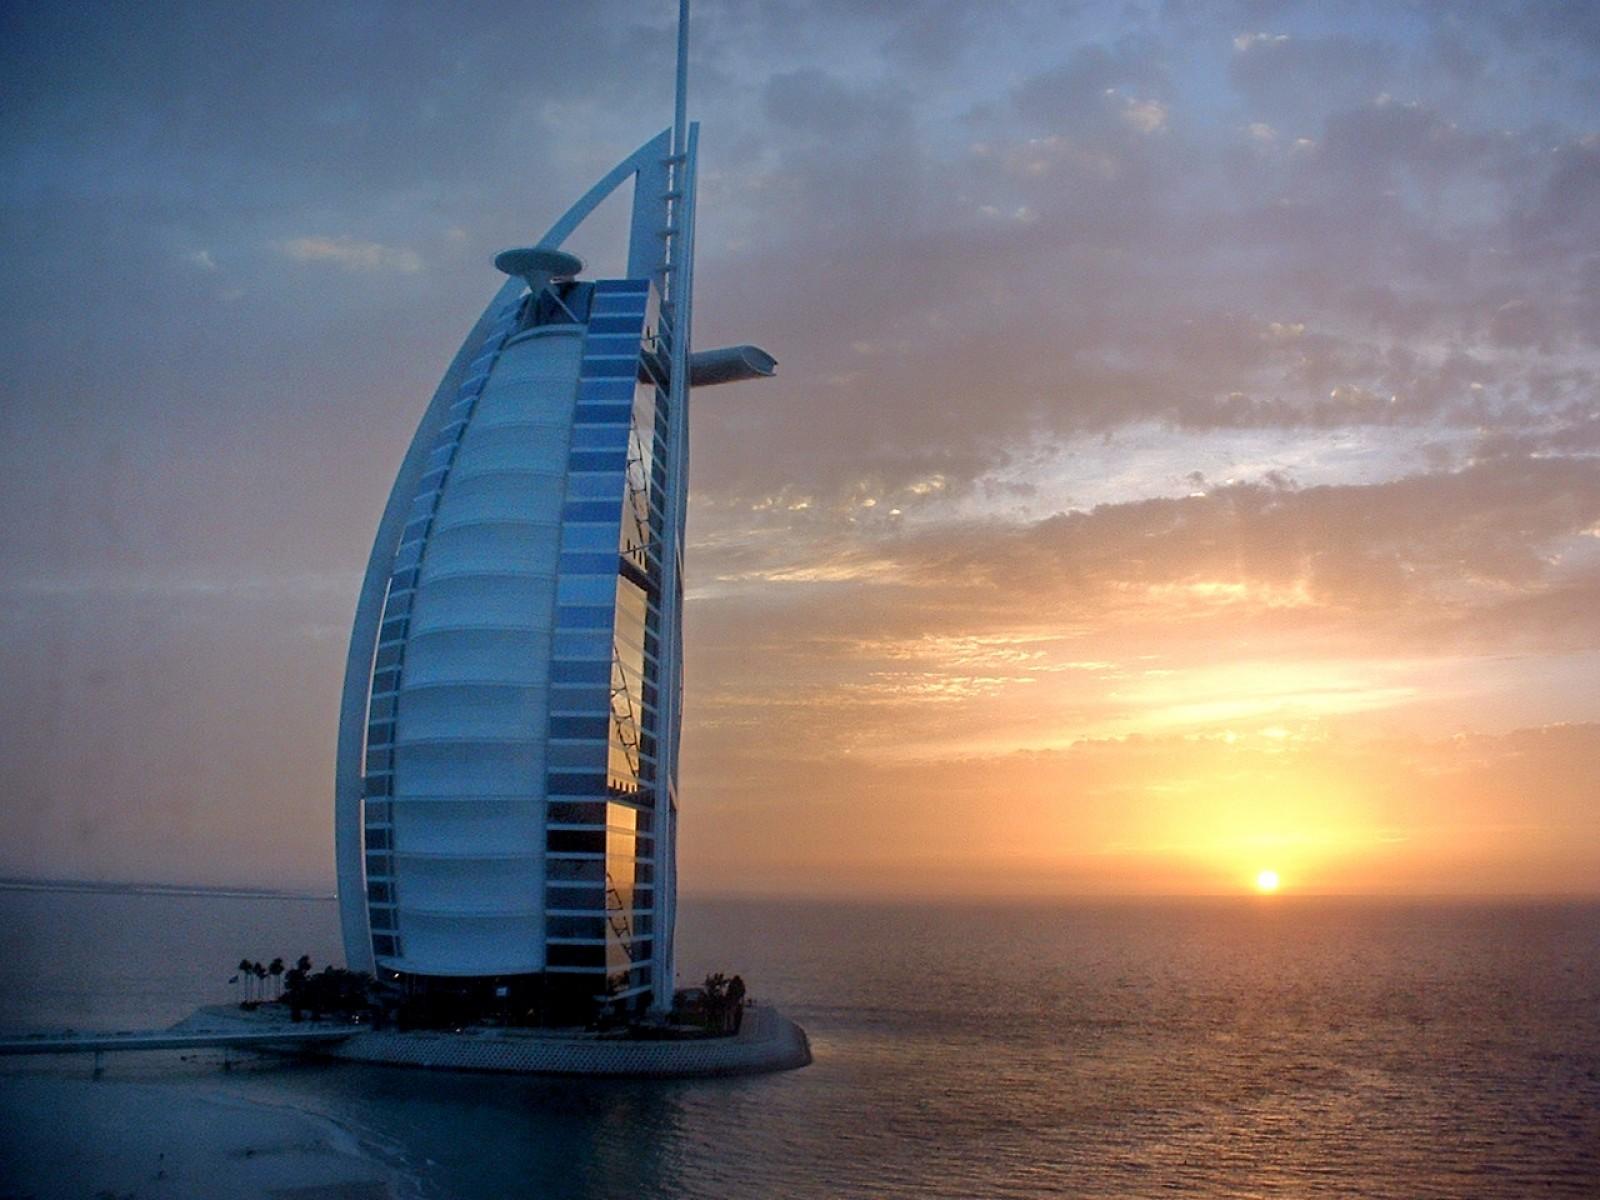 Wallpapers Free HD: Burj Al Arab